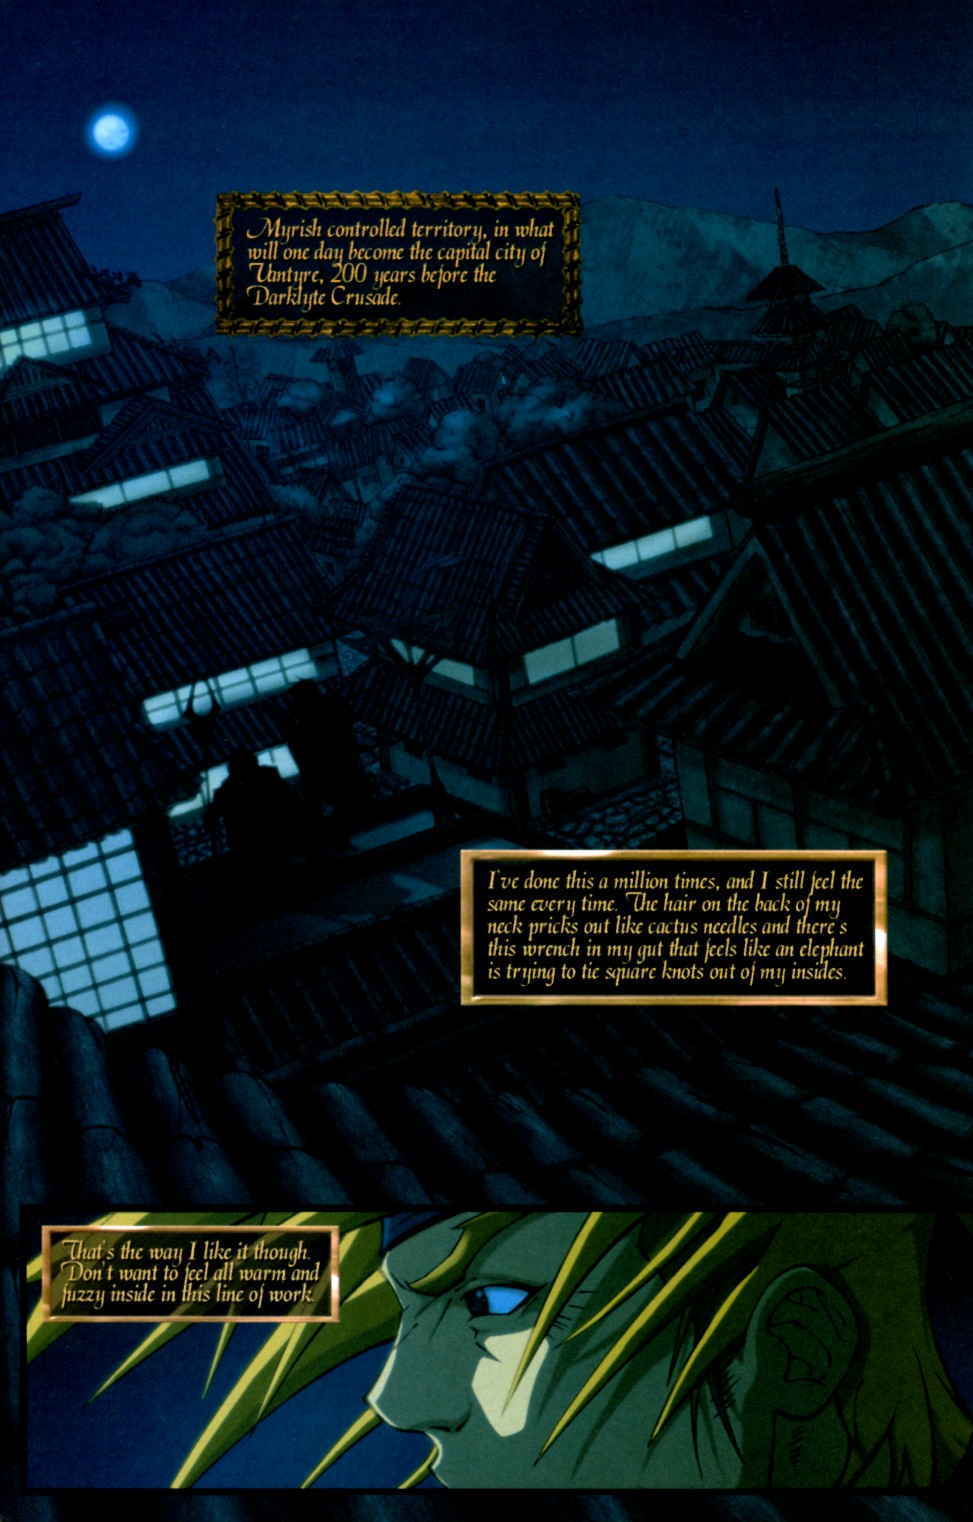 Read online Shidima comic -  Issue #0 - 3